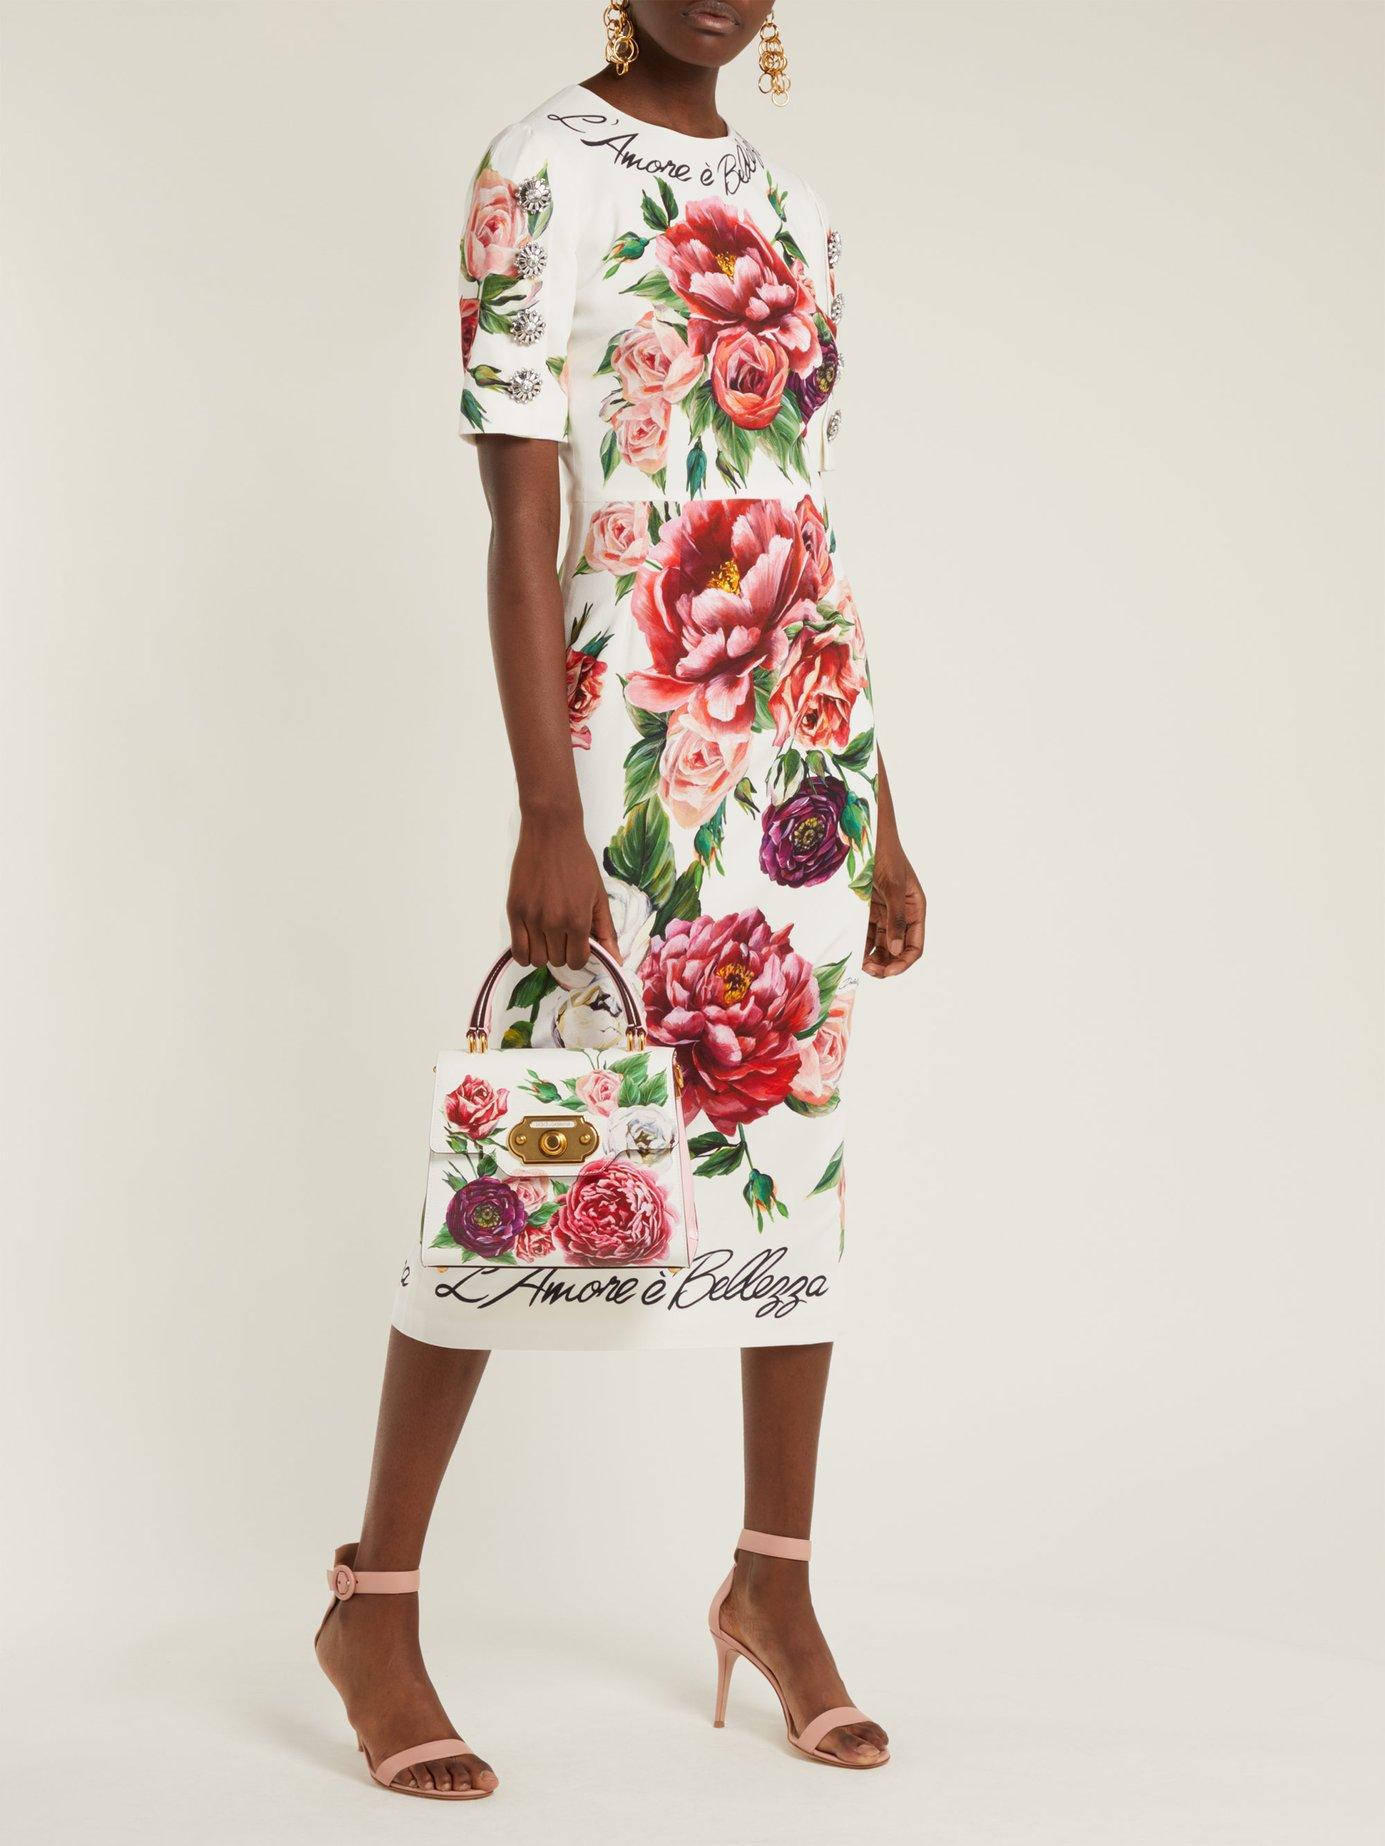 L'amore e Bellezza peony-print cady midi dress by Dolce & Gabbana